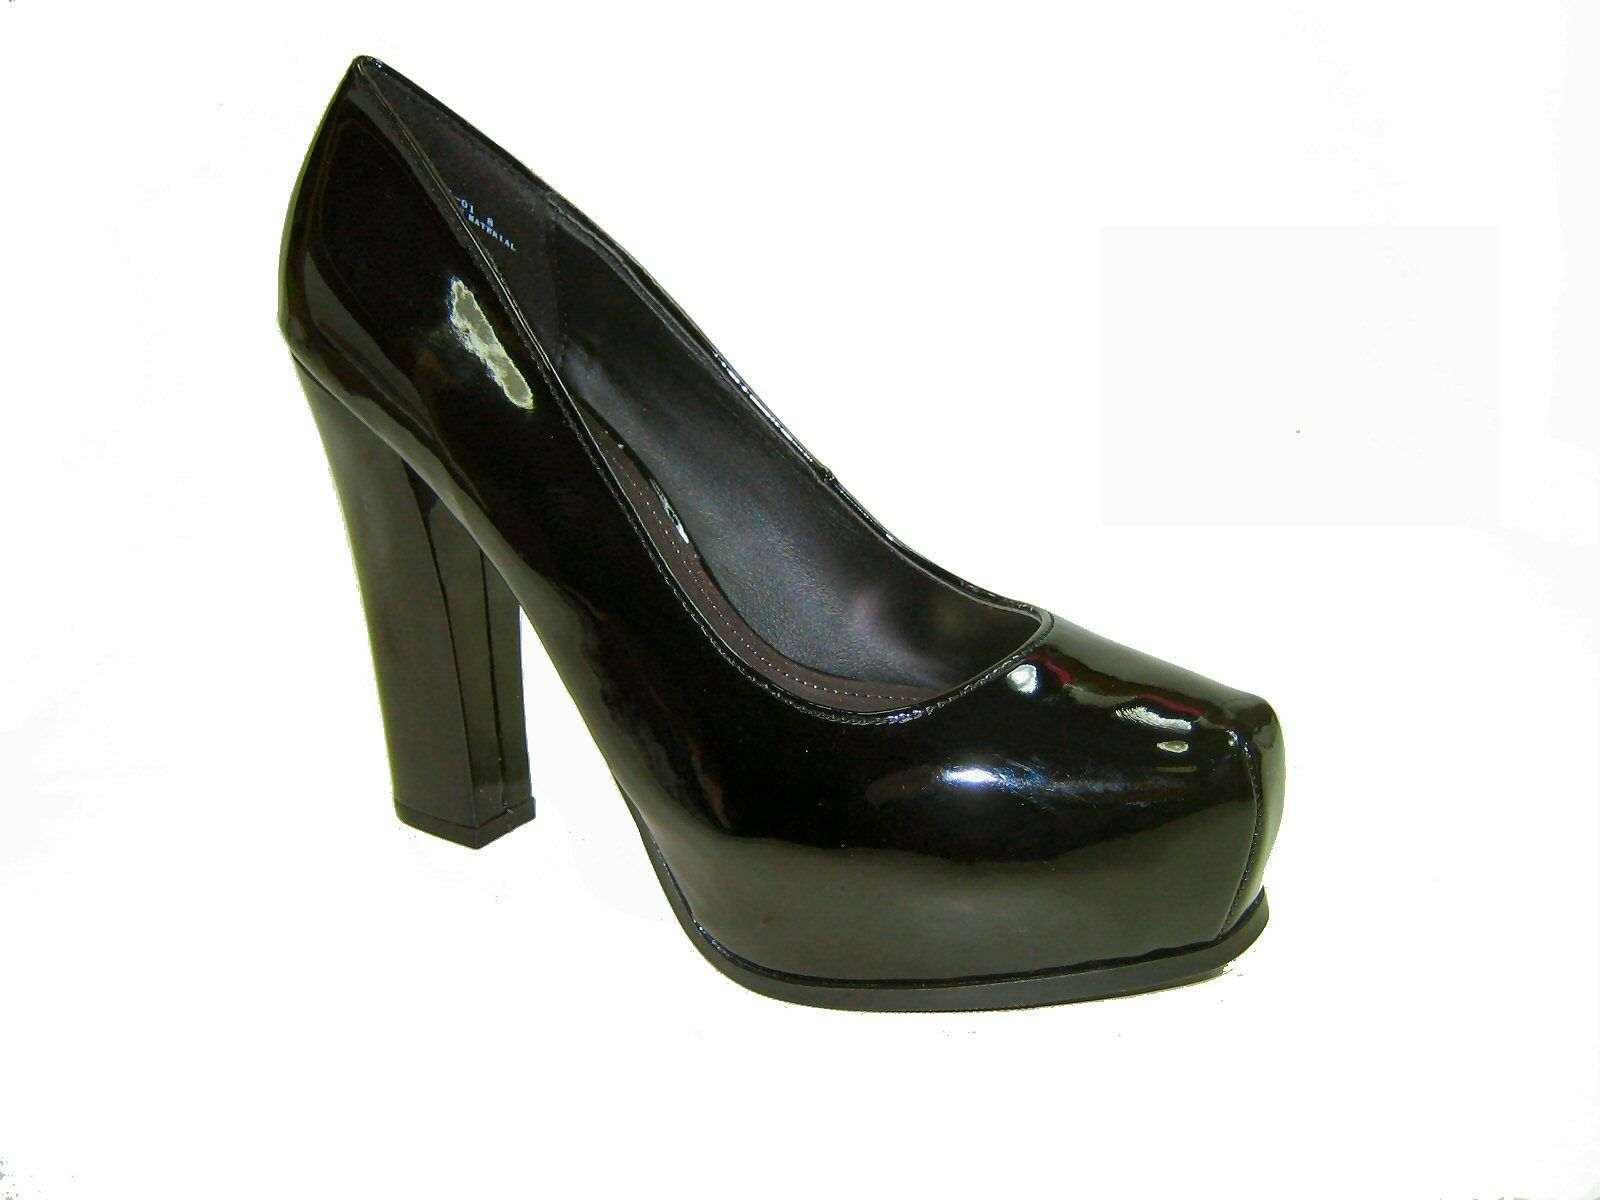 Bamboo petunia-01 platform 5 inch high heel black patent wor